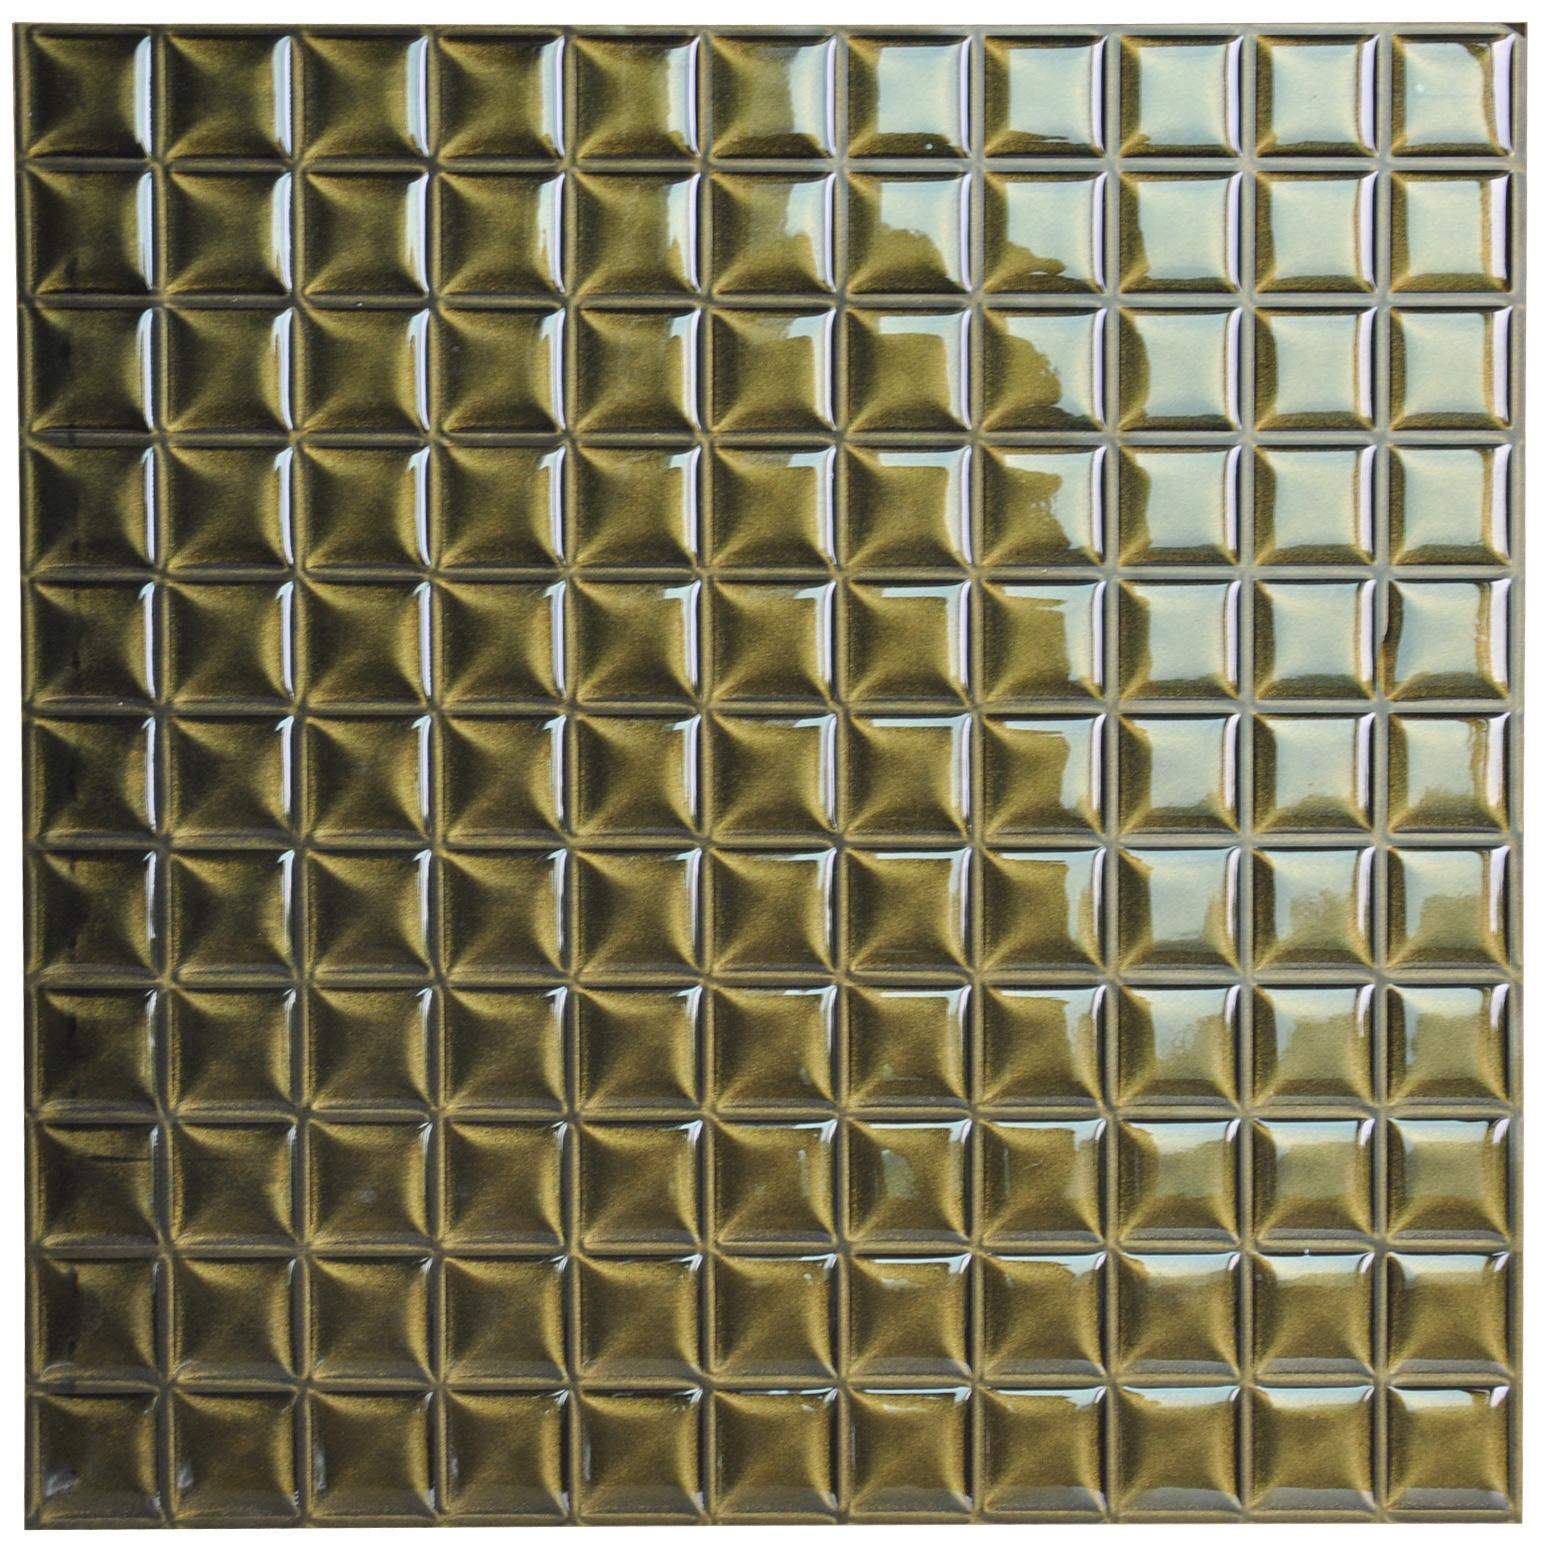 peel stick wall tiles10 pcs backsplash for kitchen n bathroom 9 5 sq